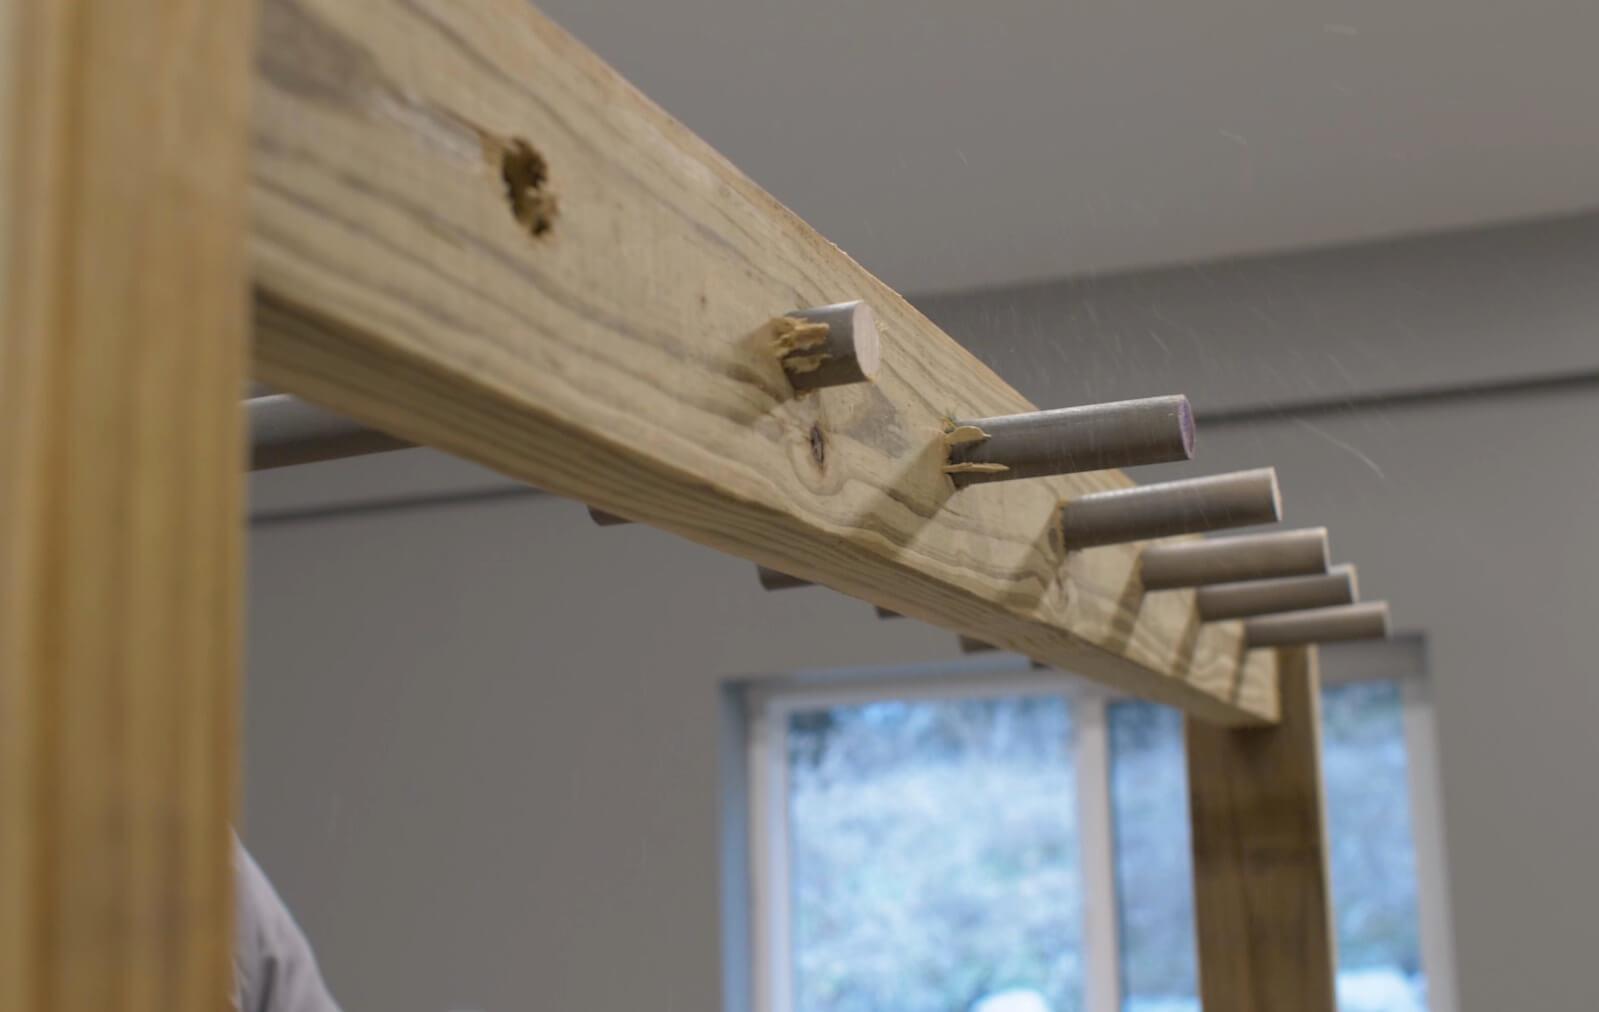 How to build a Hockey Stick Rack Step 7